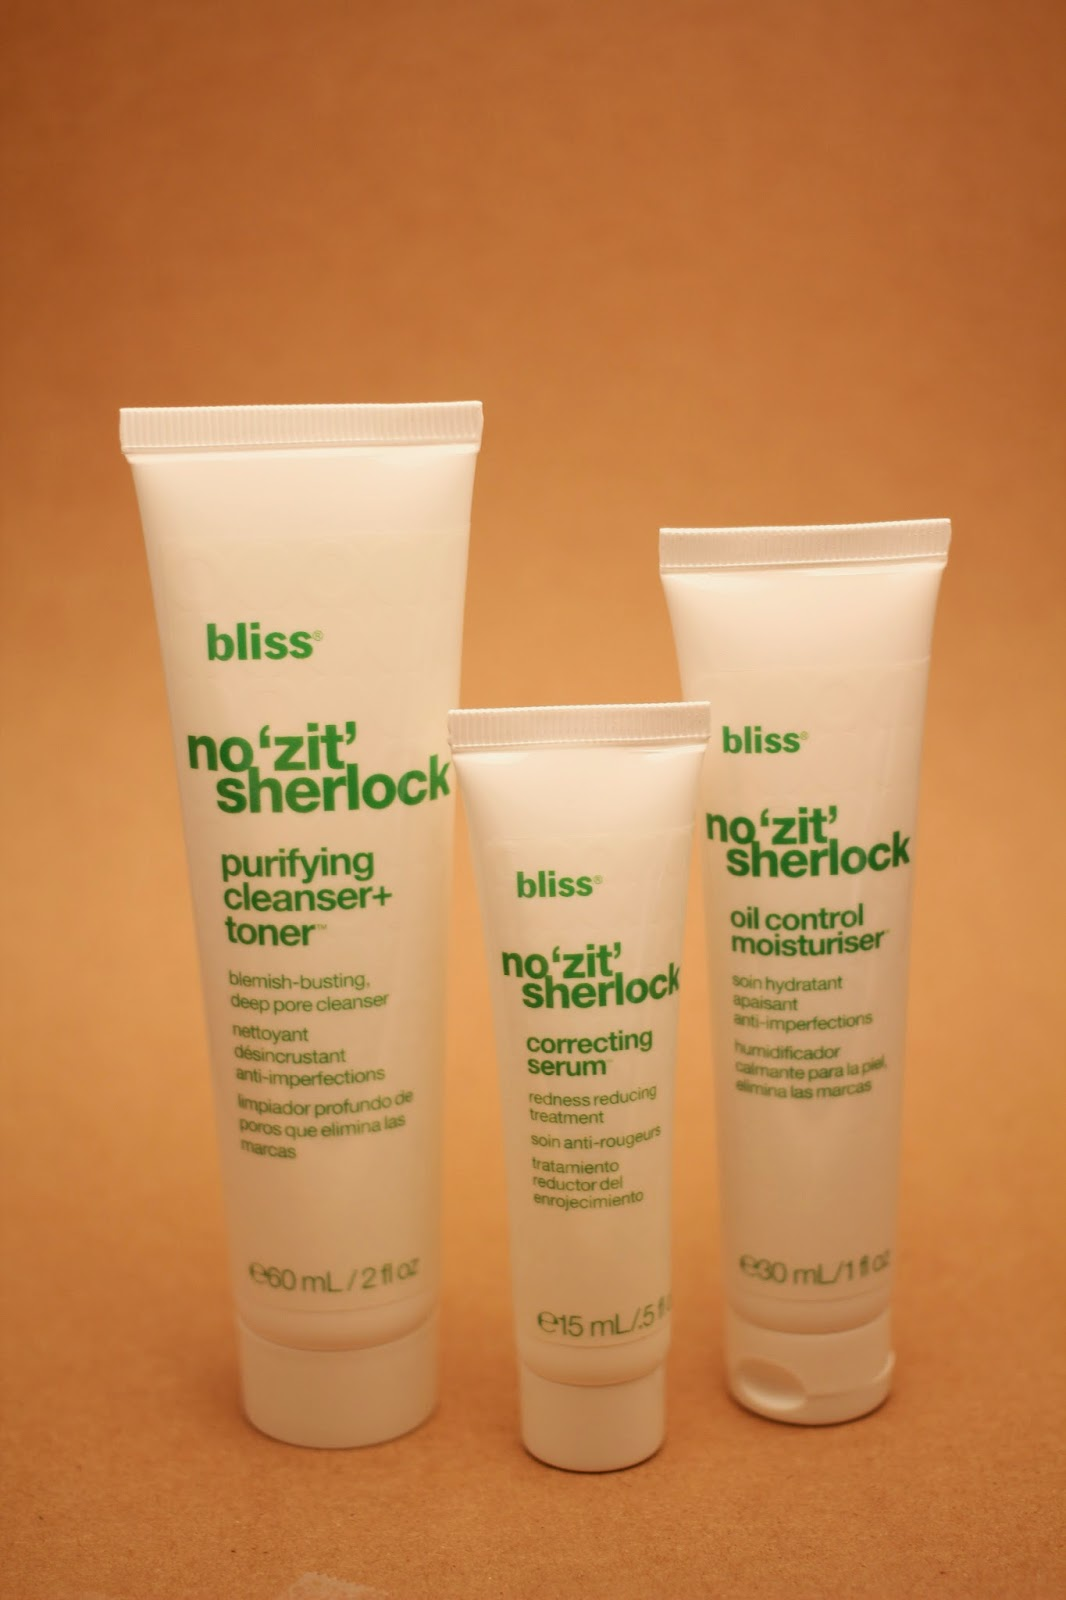 bliss not zit sherlock, review, skincare product, no zit sherlock kit,